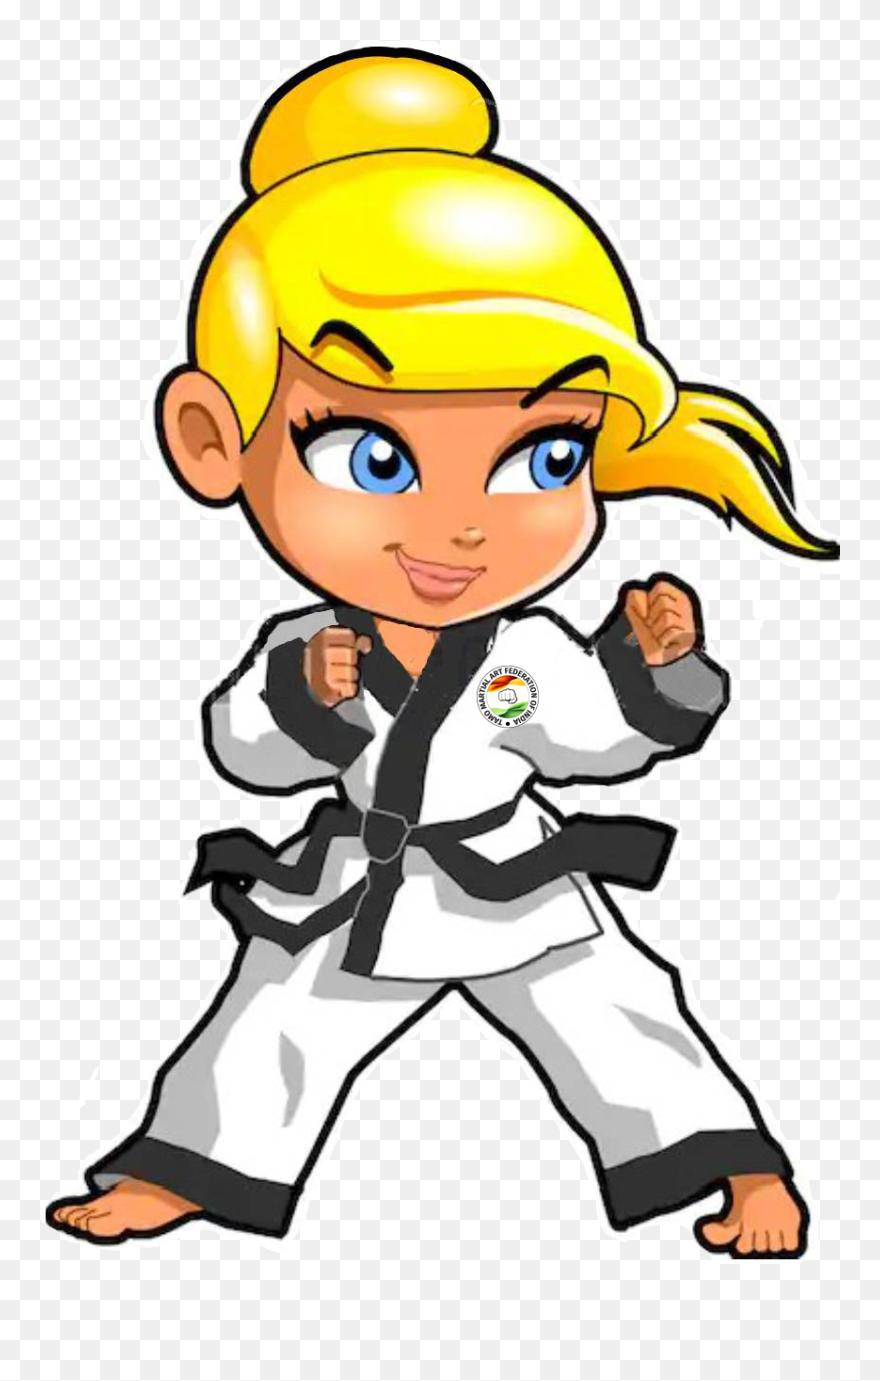 Tamo Martial Art Karate Girl Cartoon Drawing Clipart 5410463 Pinclipart